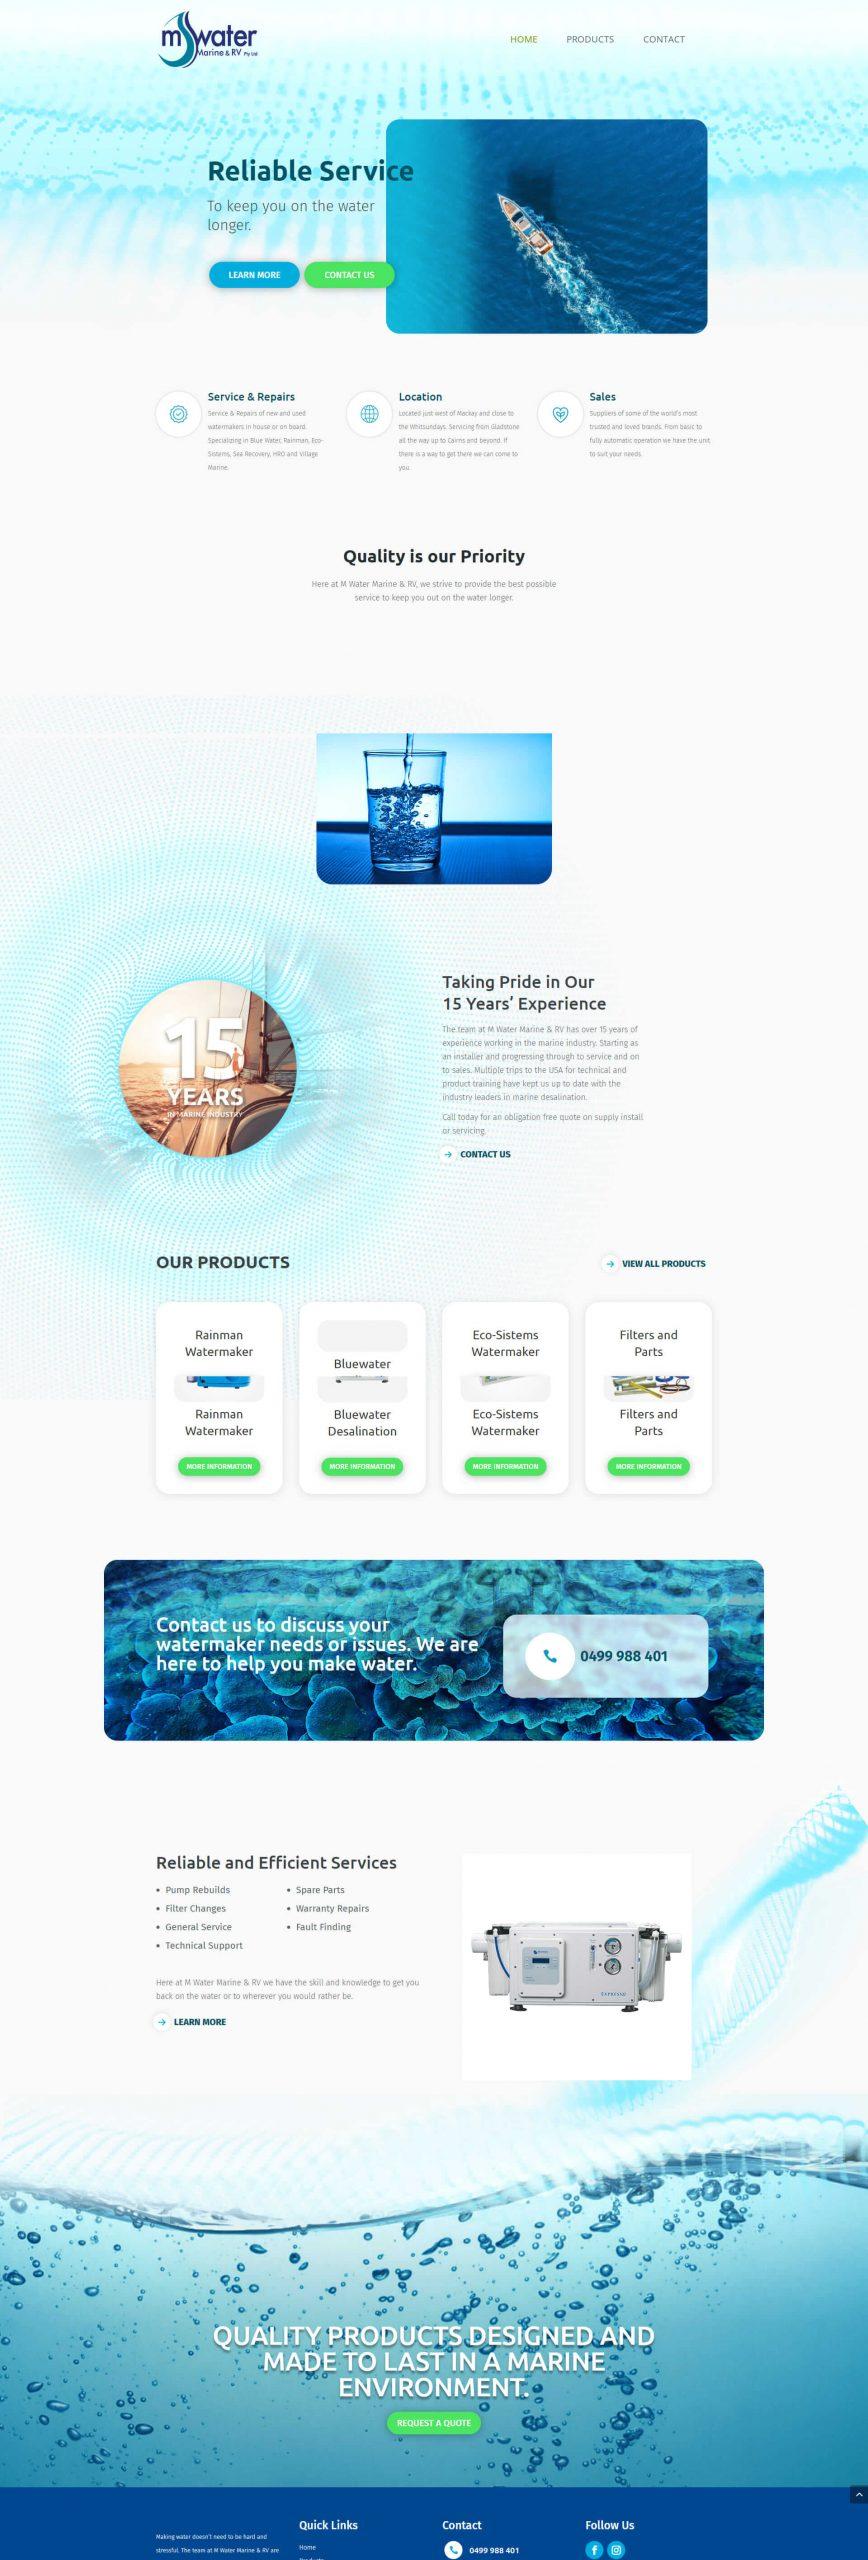 MWater Homepage